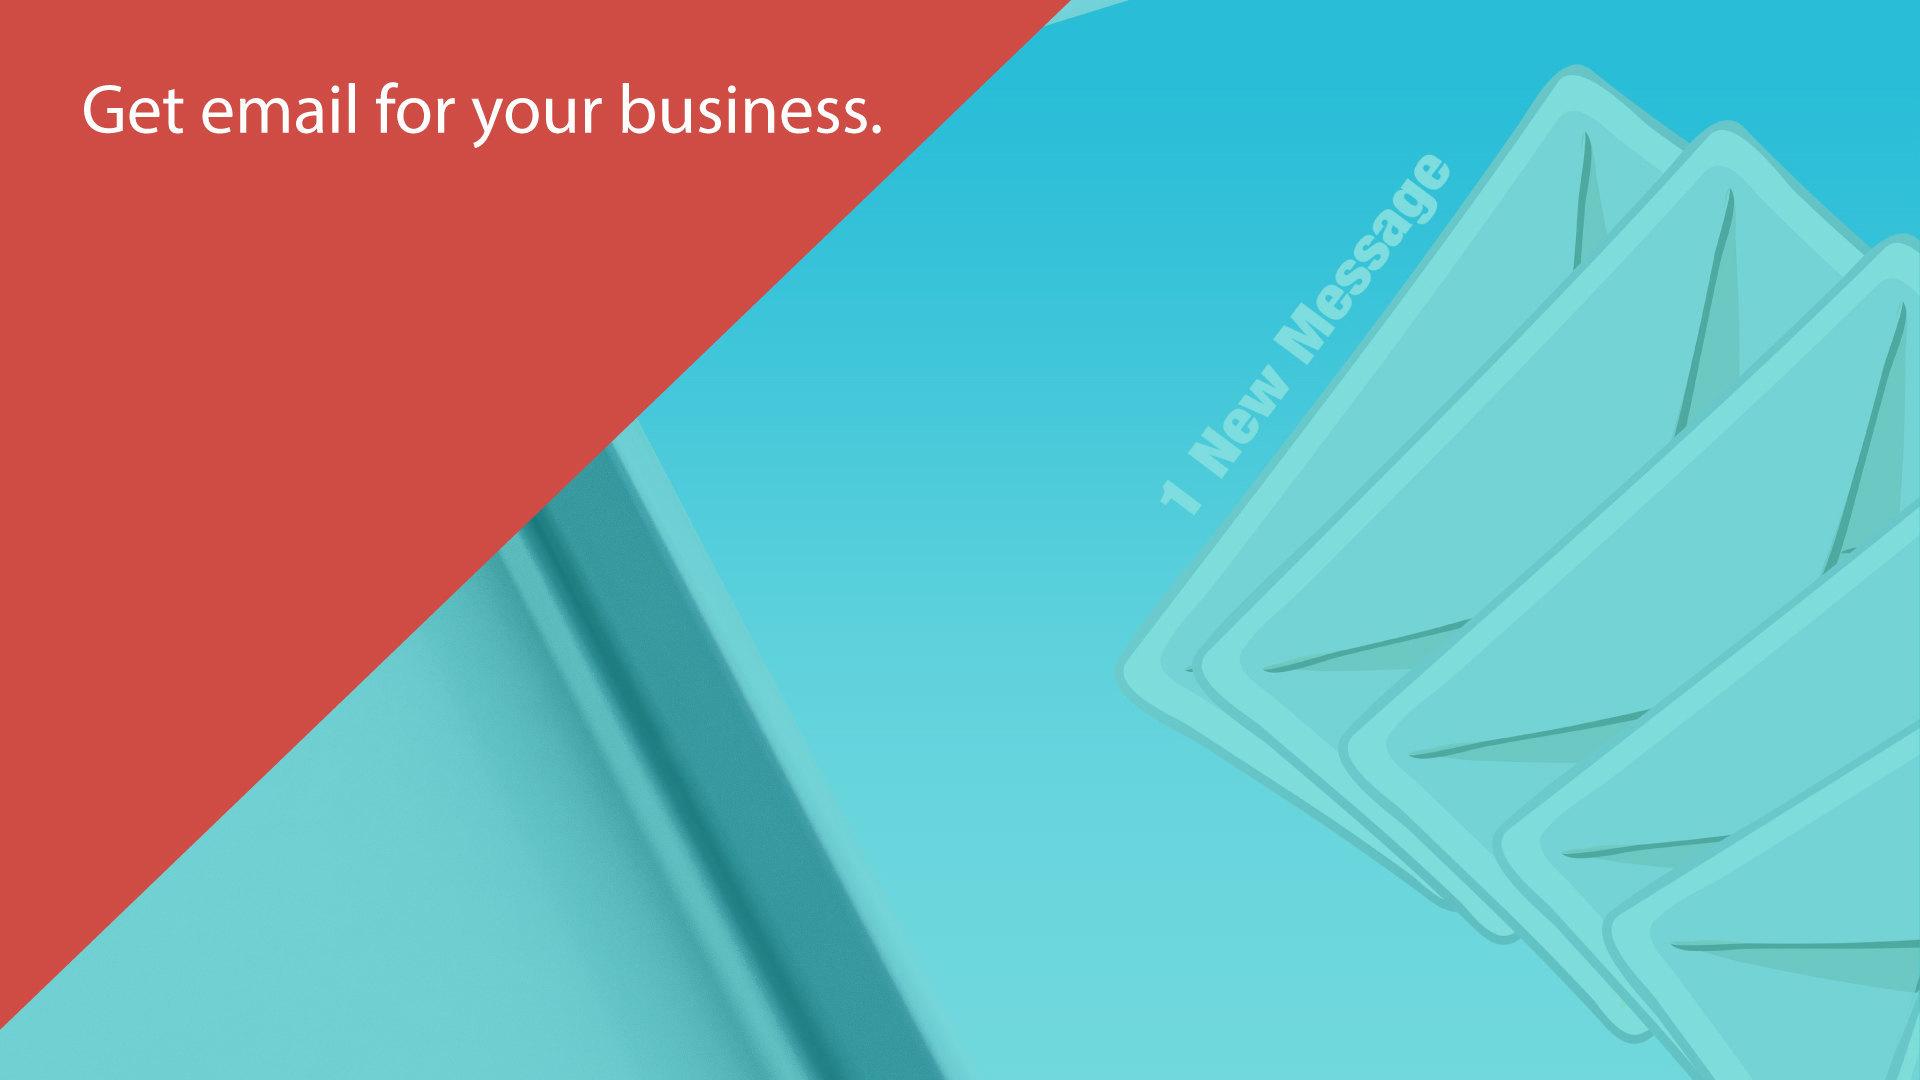 How do i create a business email